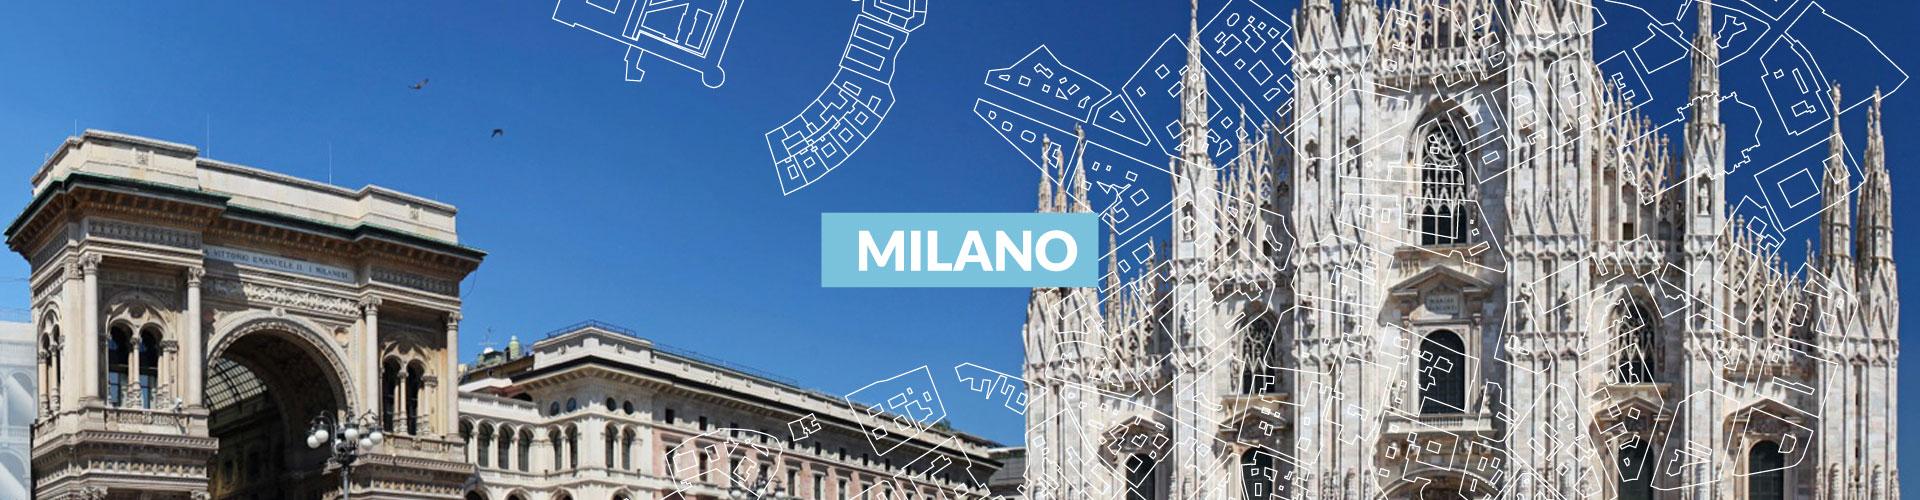 milano_slide-min